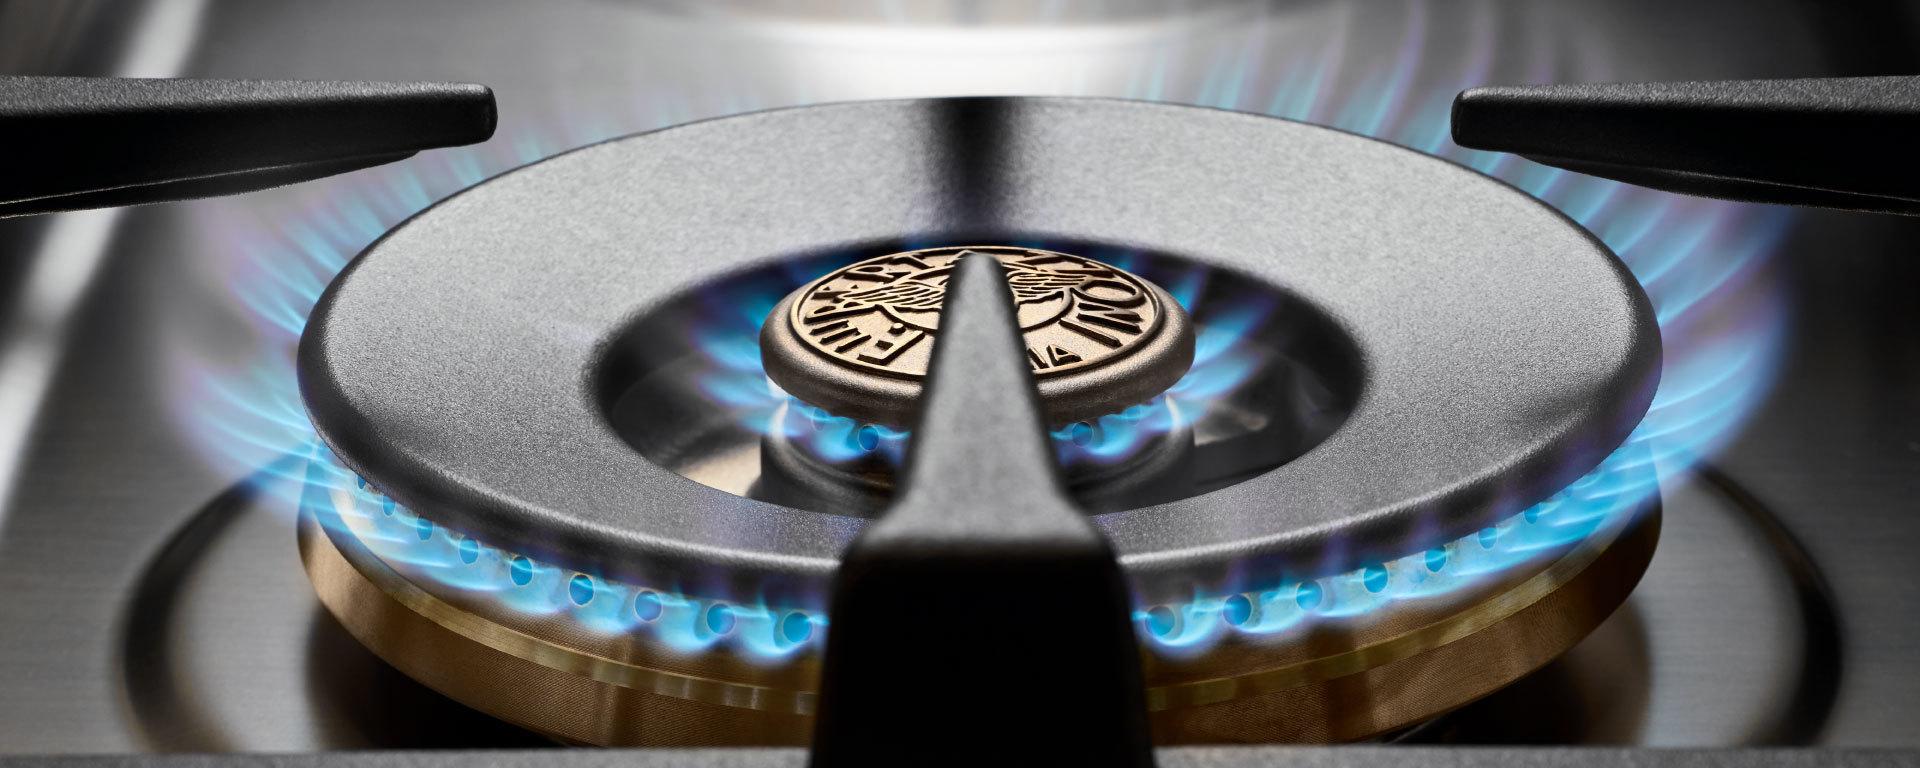 Электрическая плита Bertazzoni PRO1005IMFEDGIT